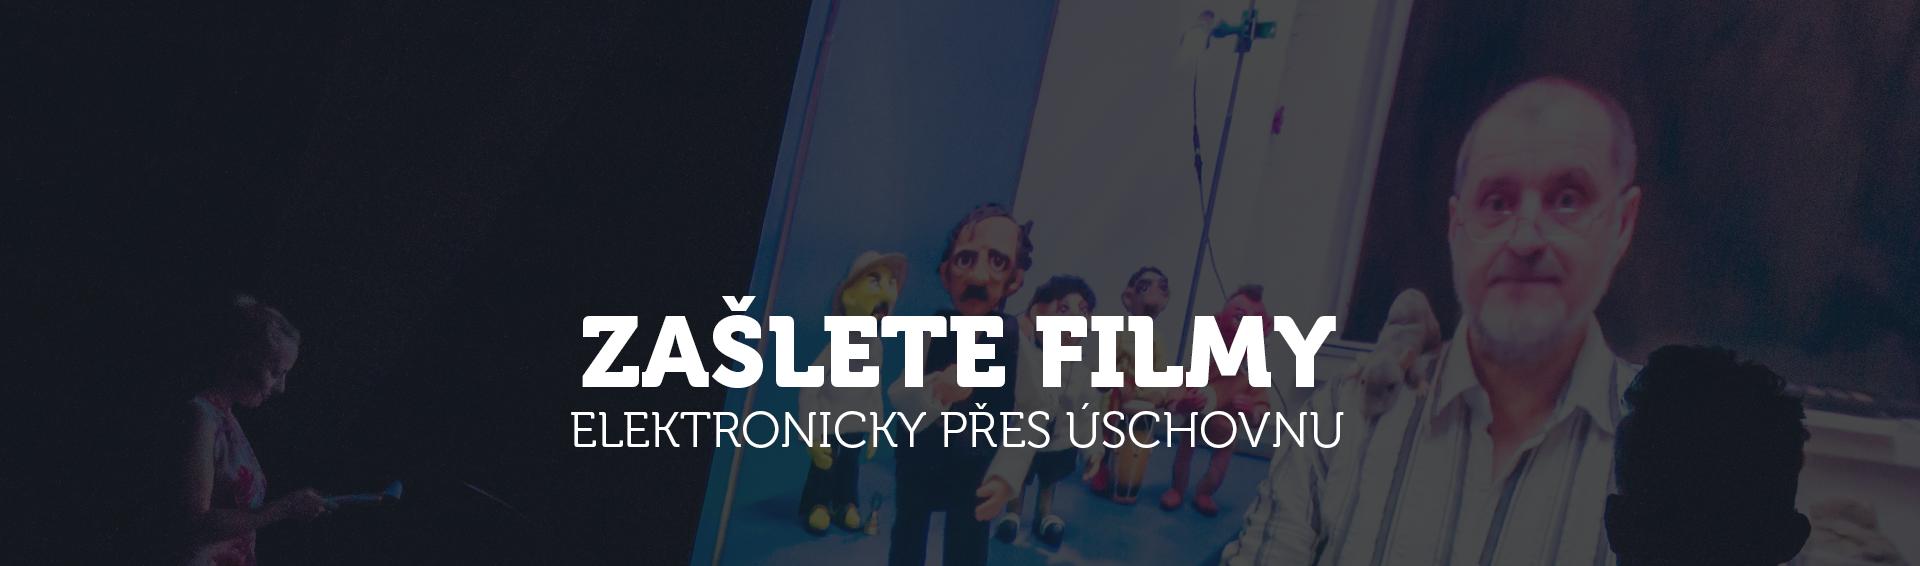 FFCV2018-uvodni-foto-na-web-_-zaslete-filmy